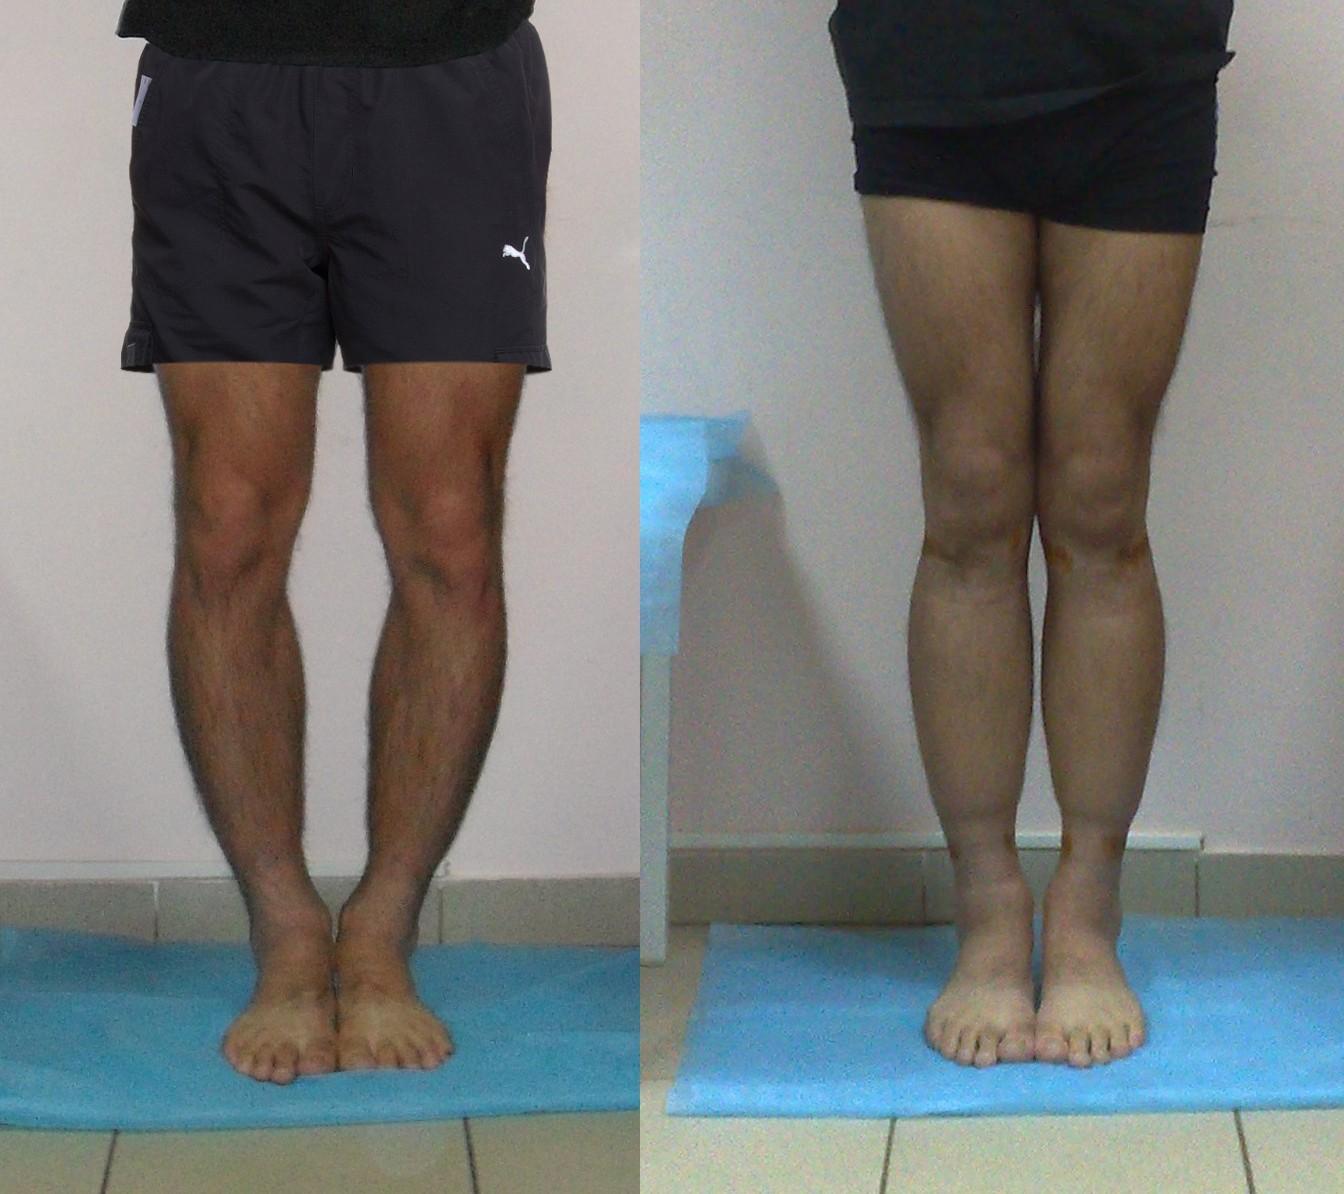 Форма женских ног фото 14 фотография